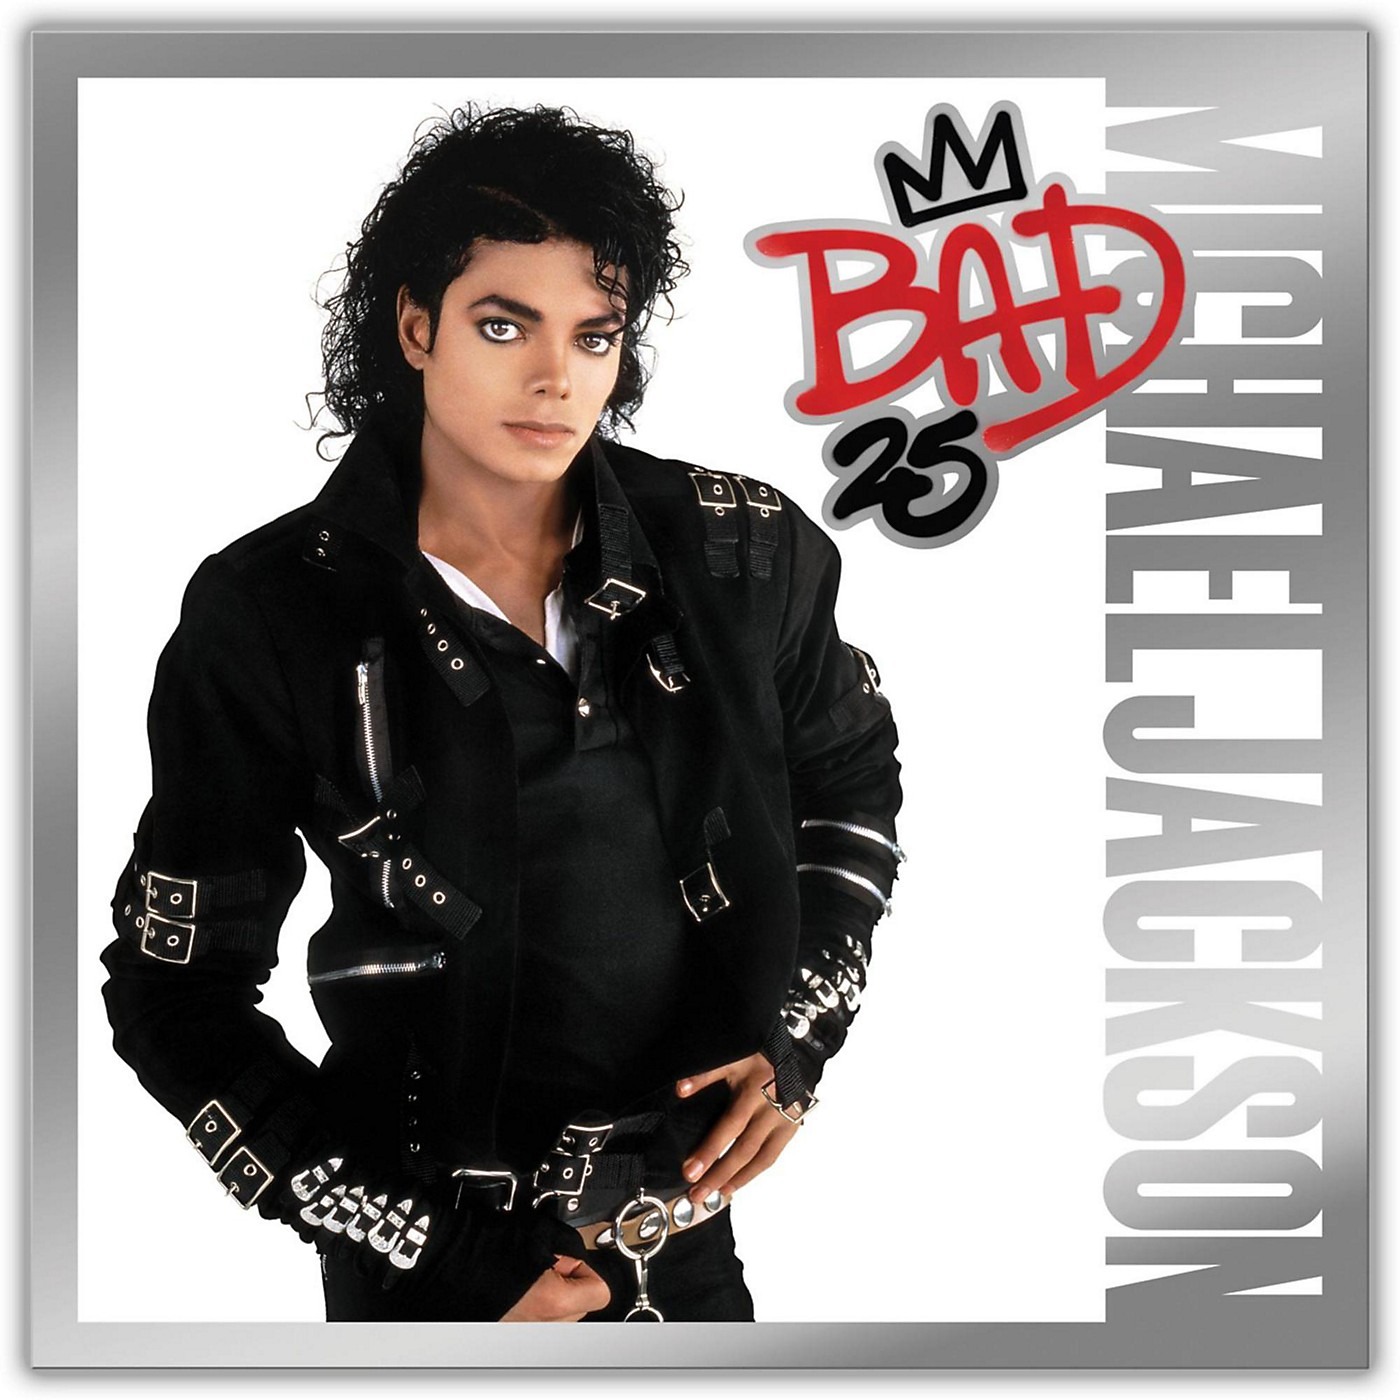 Sony Michael Jackson - Bad (25th Anniversary Edition) Vinyl LP thumbnail